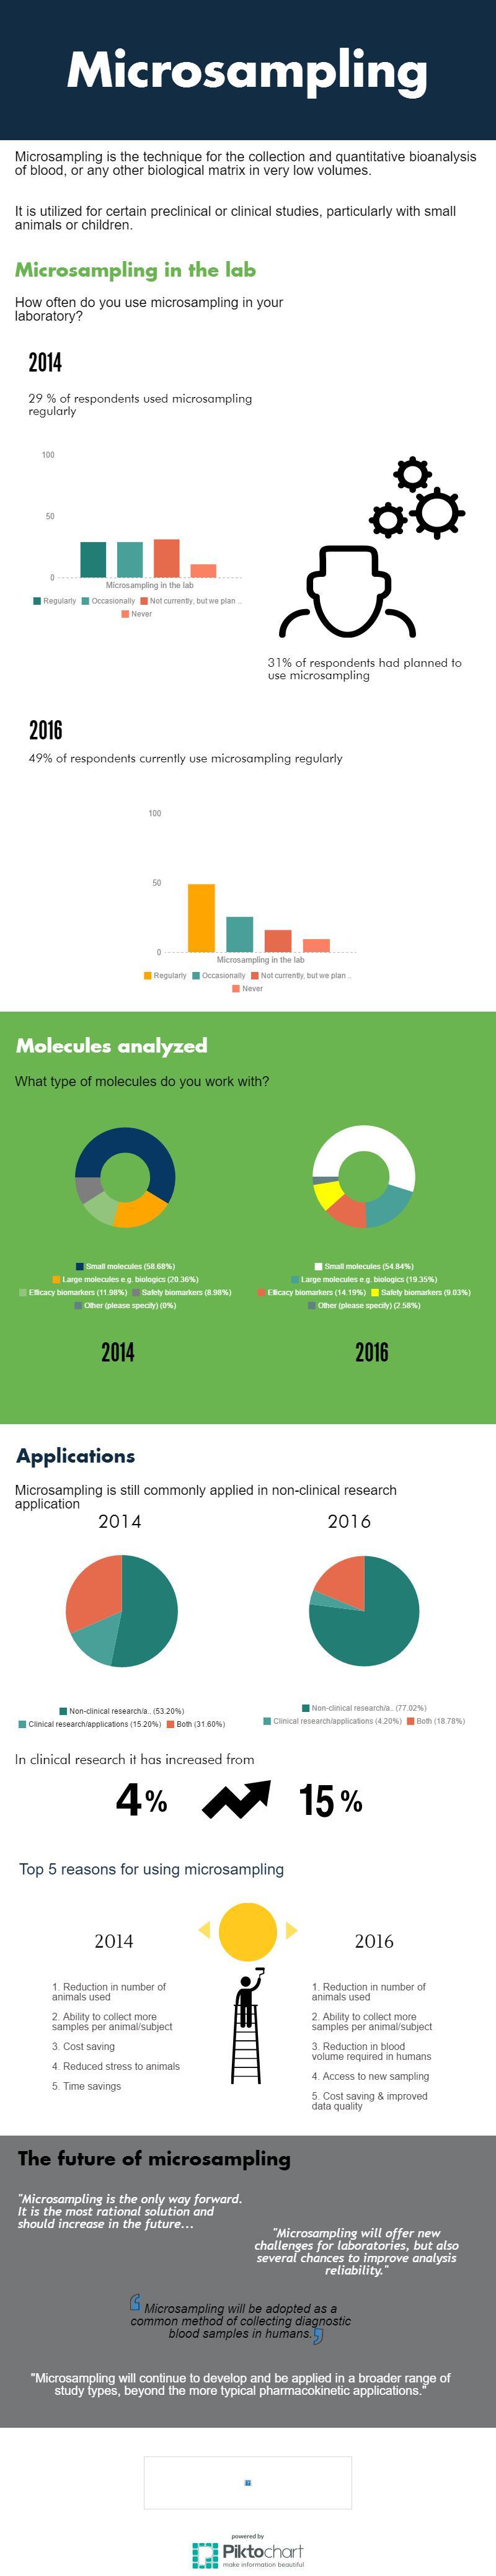 microsampling-infographic